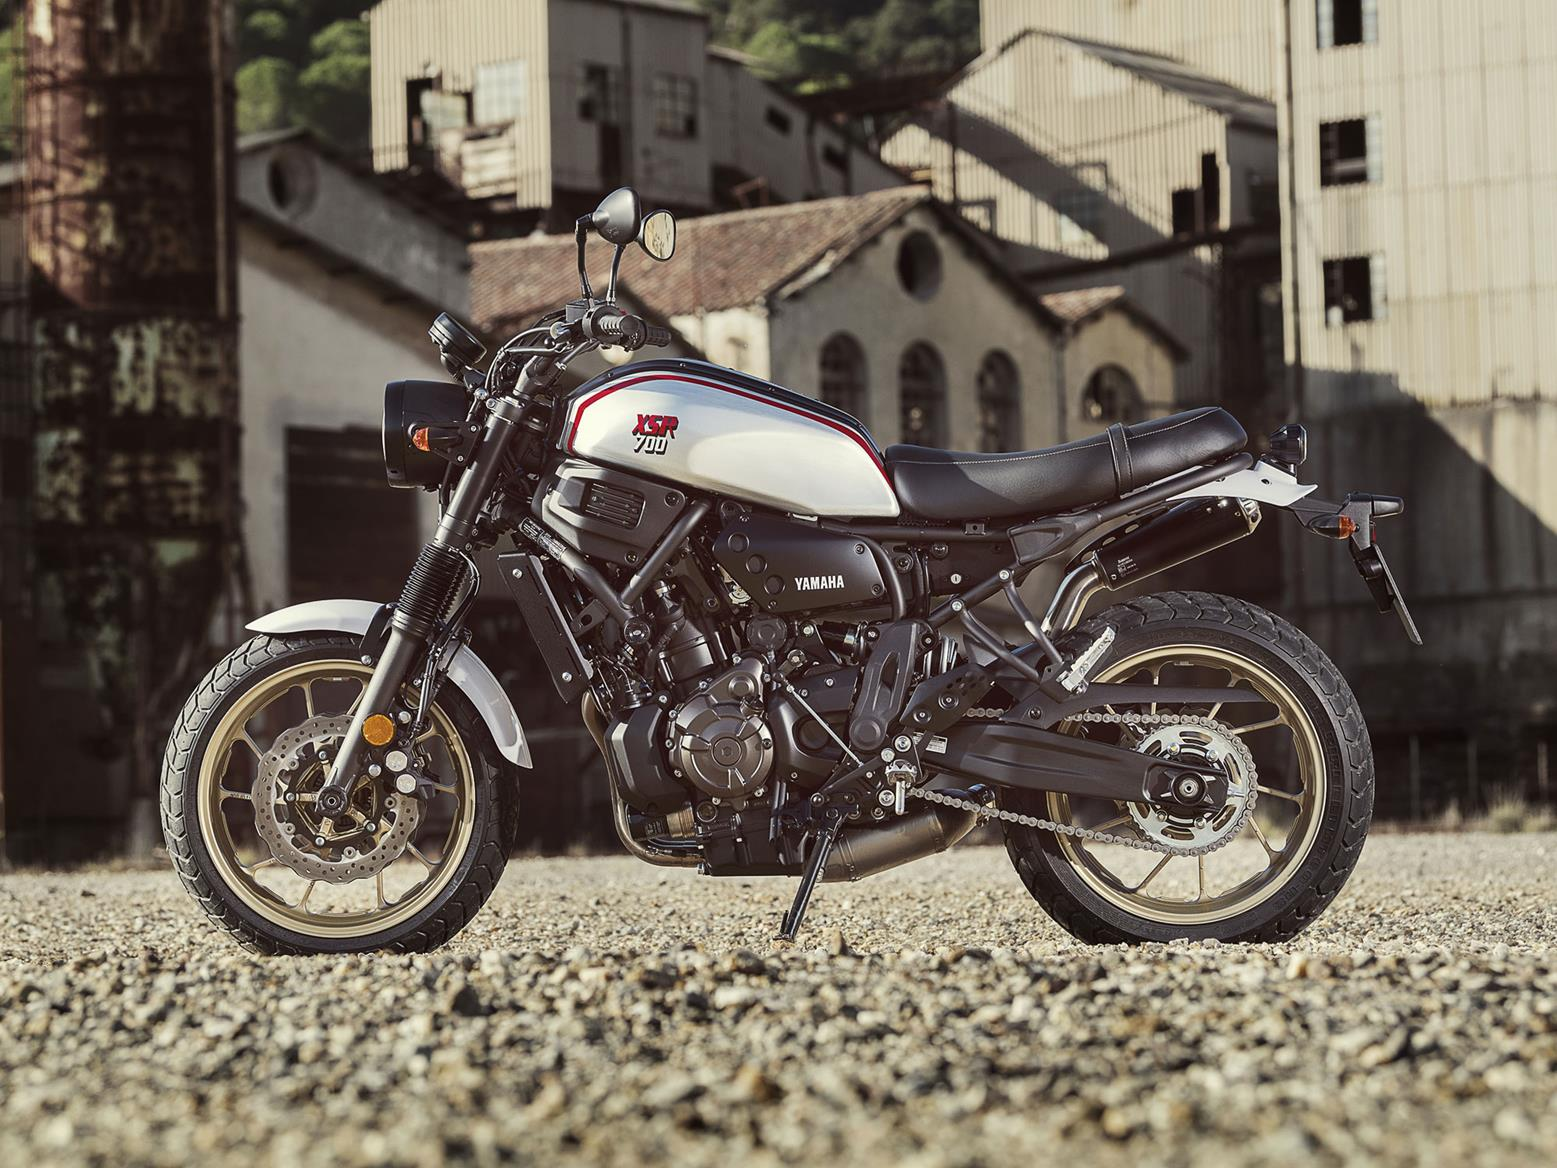 Yamaha XSR XTribute side profile